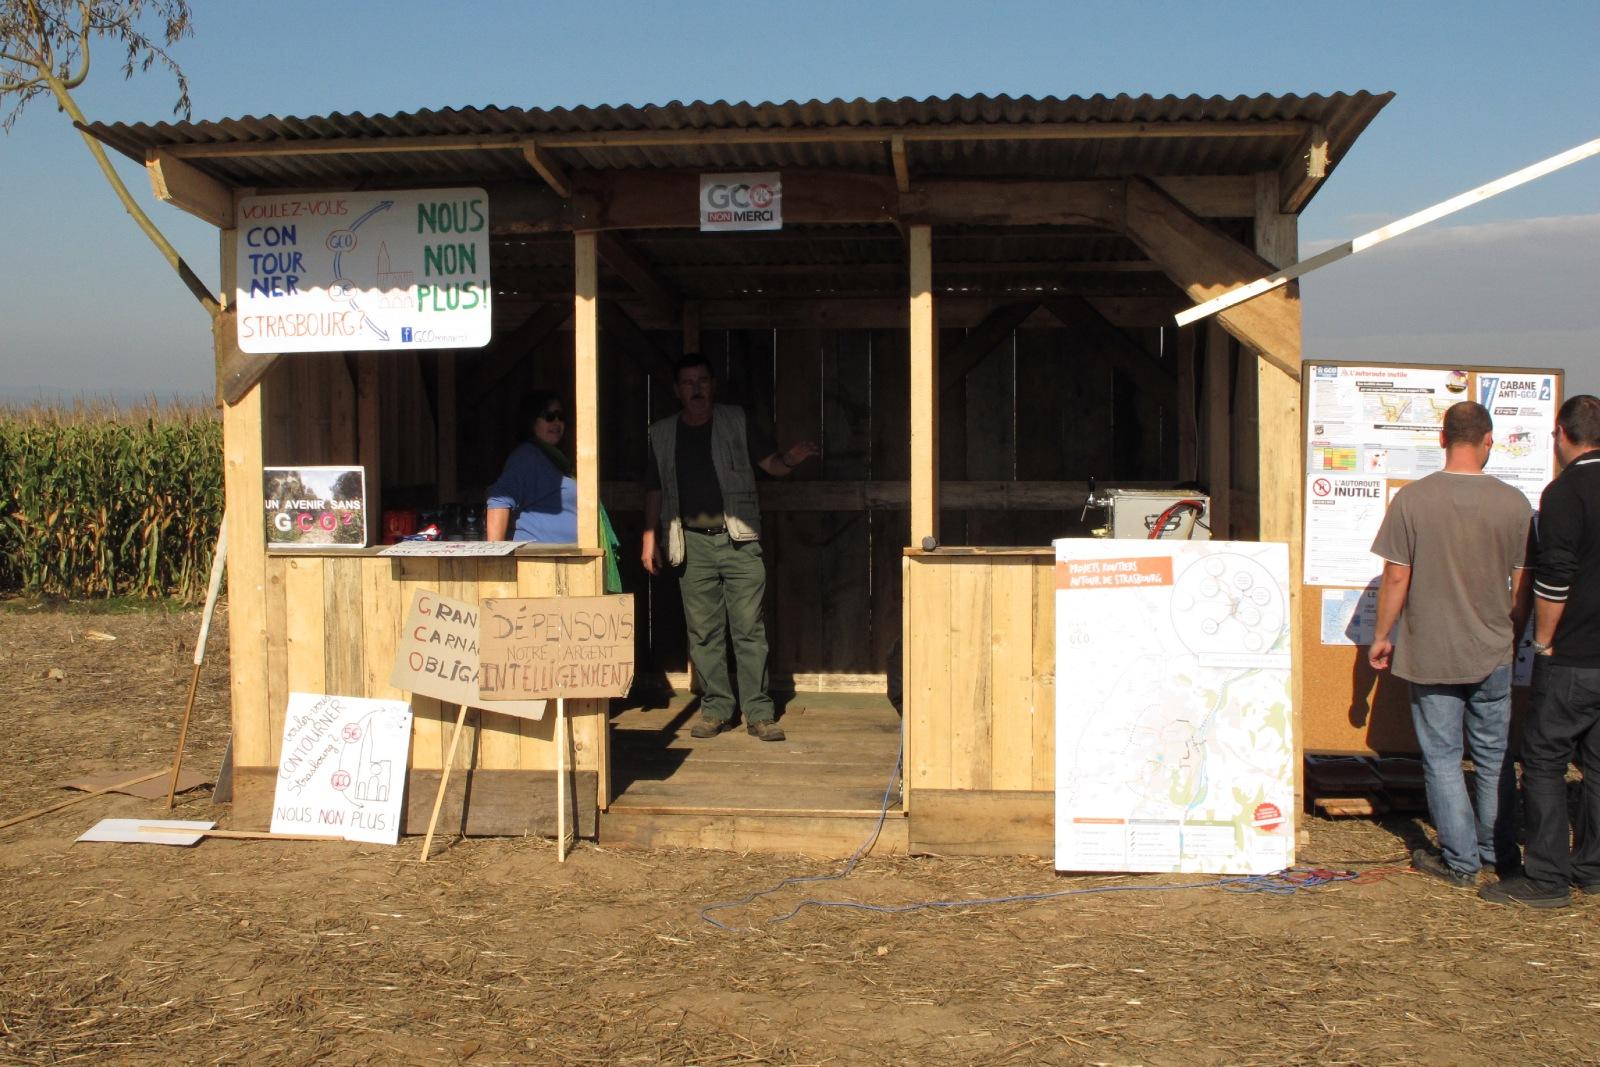 [mobilisation] GCO : Inauguration de la cabane N°2 :  « citoyens debout »